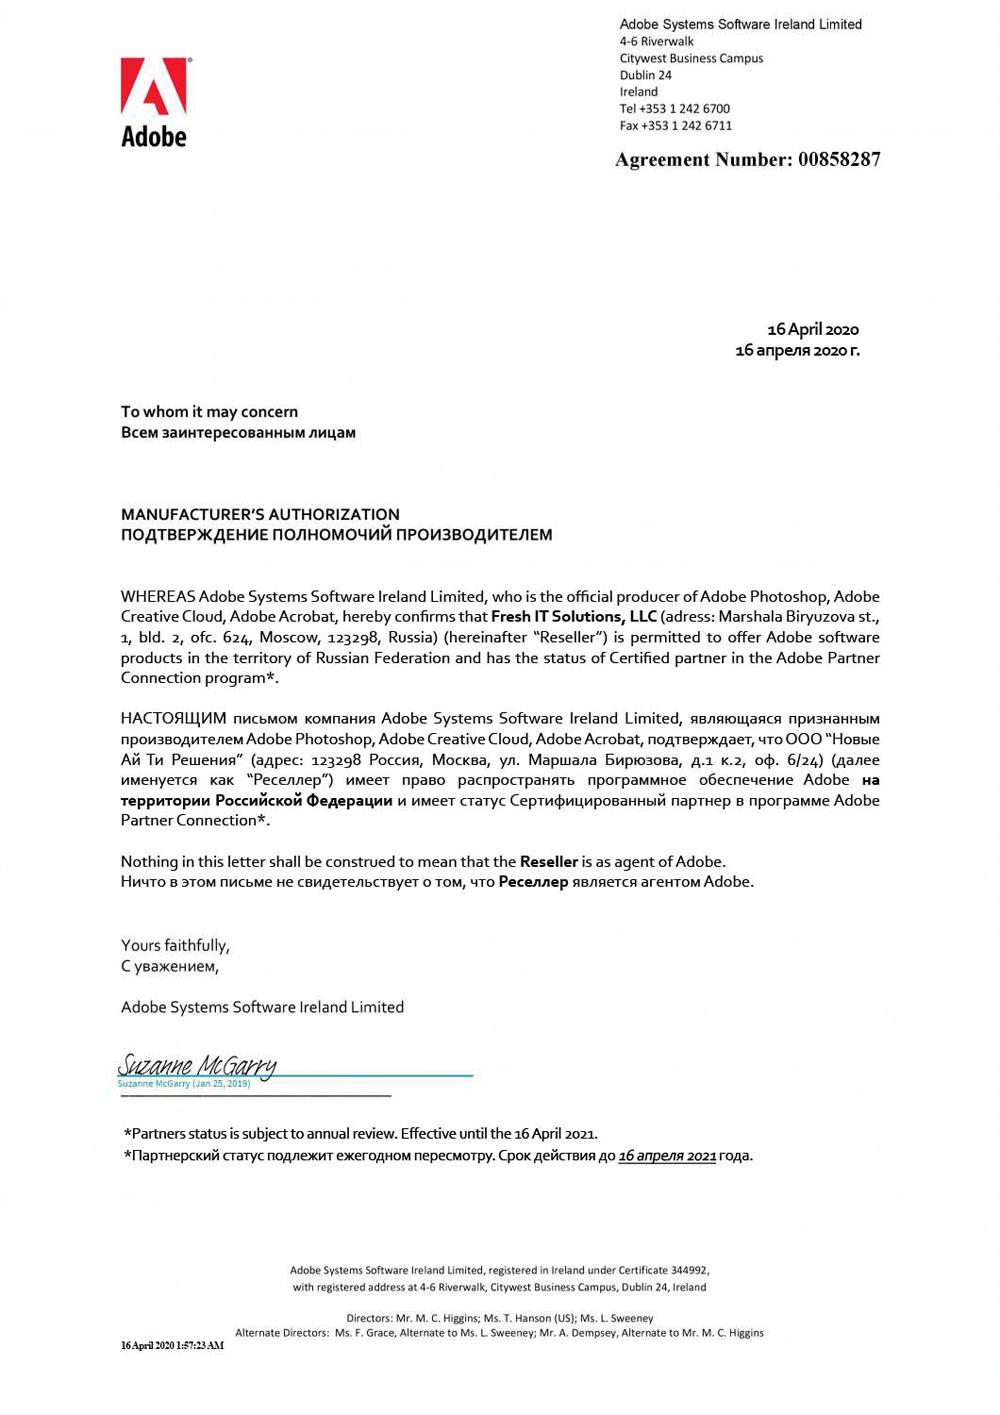 Majordev - Adobe Certified Reseller